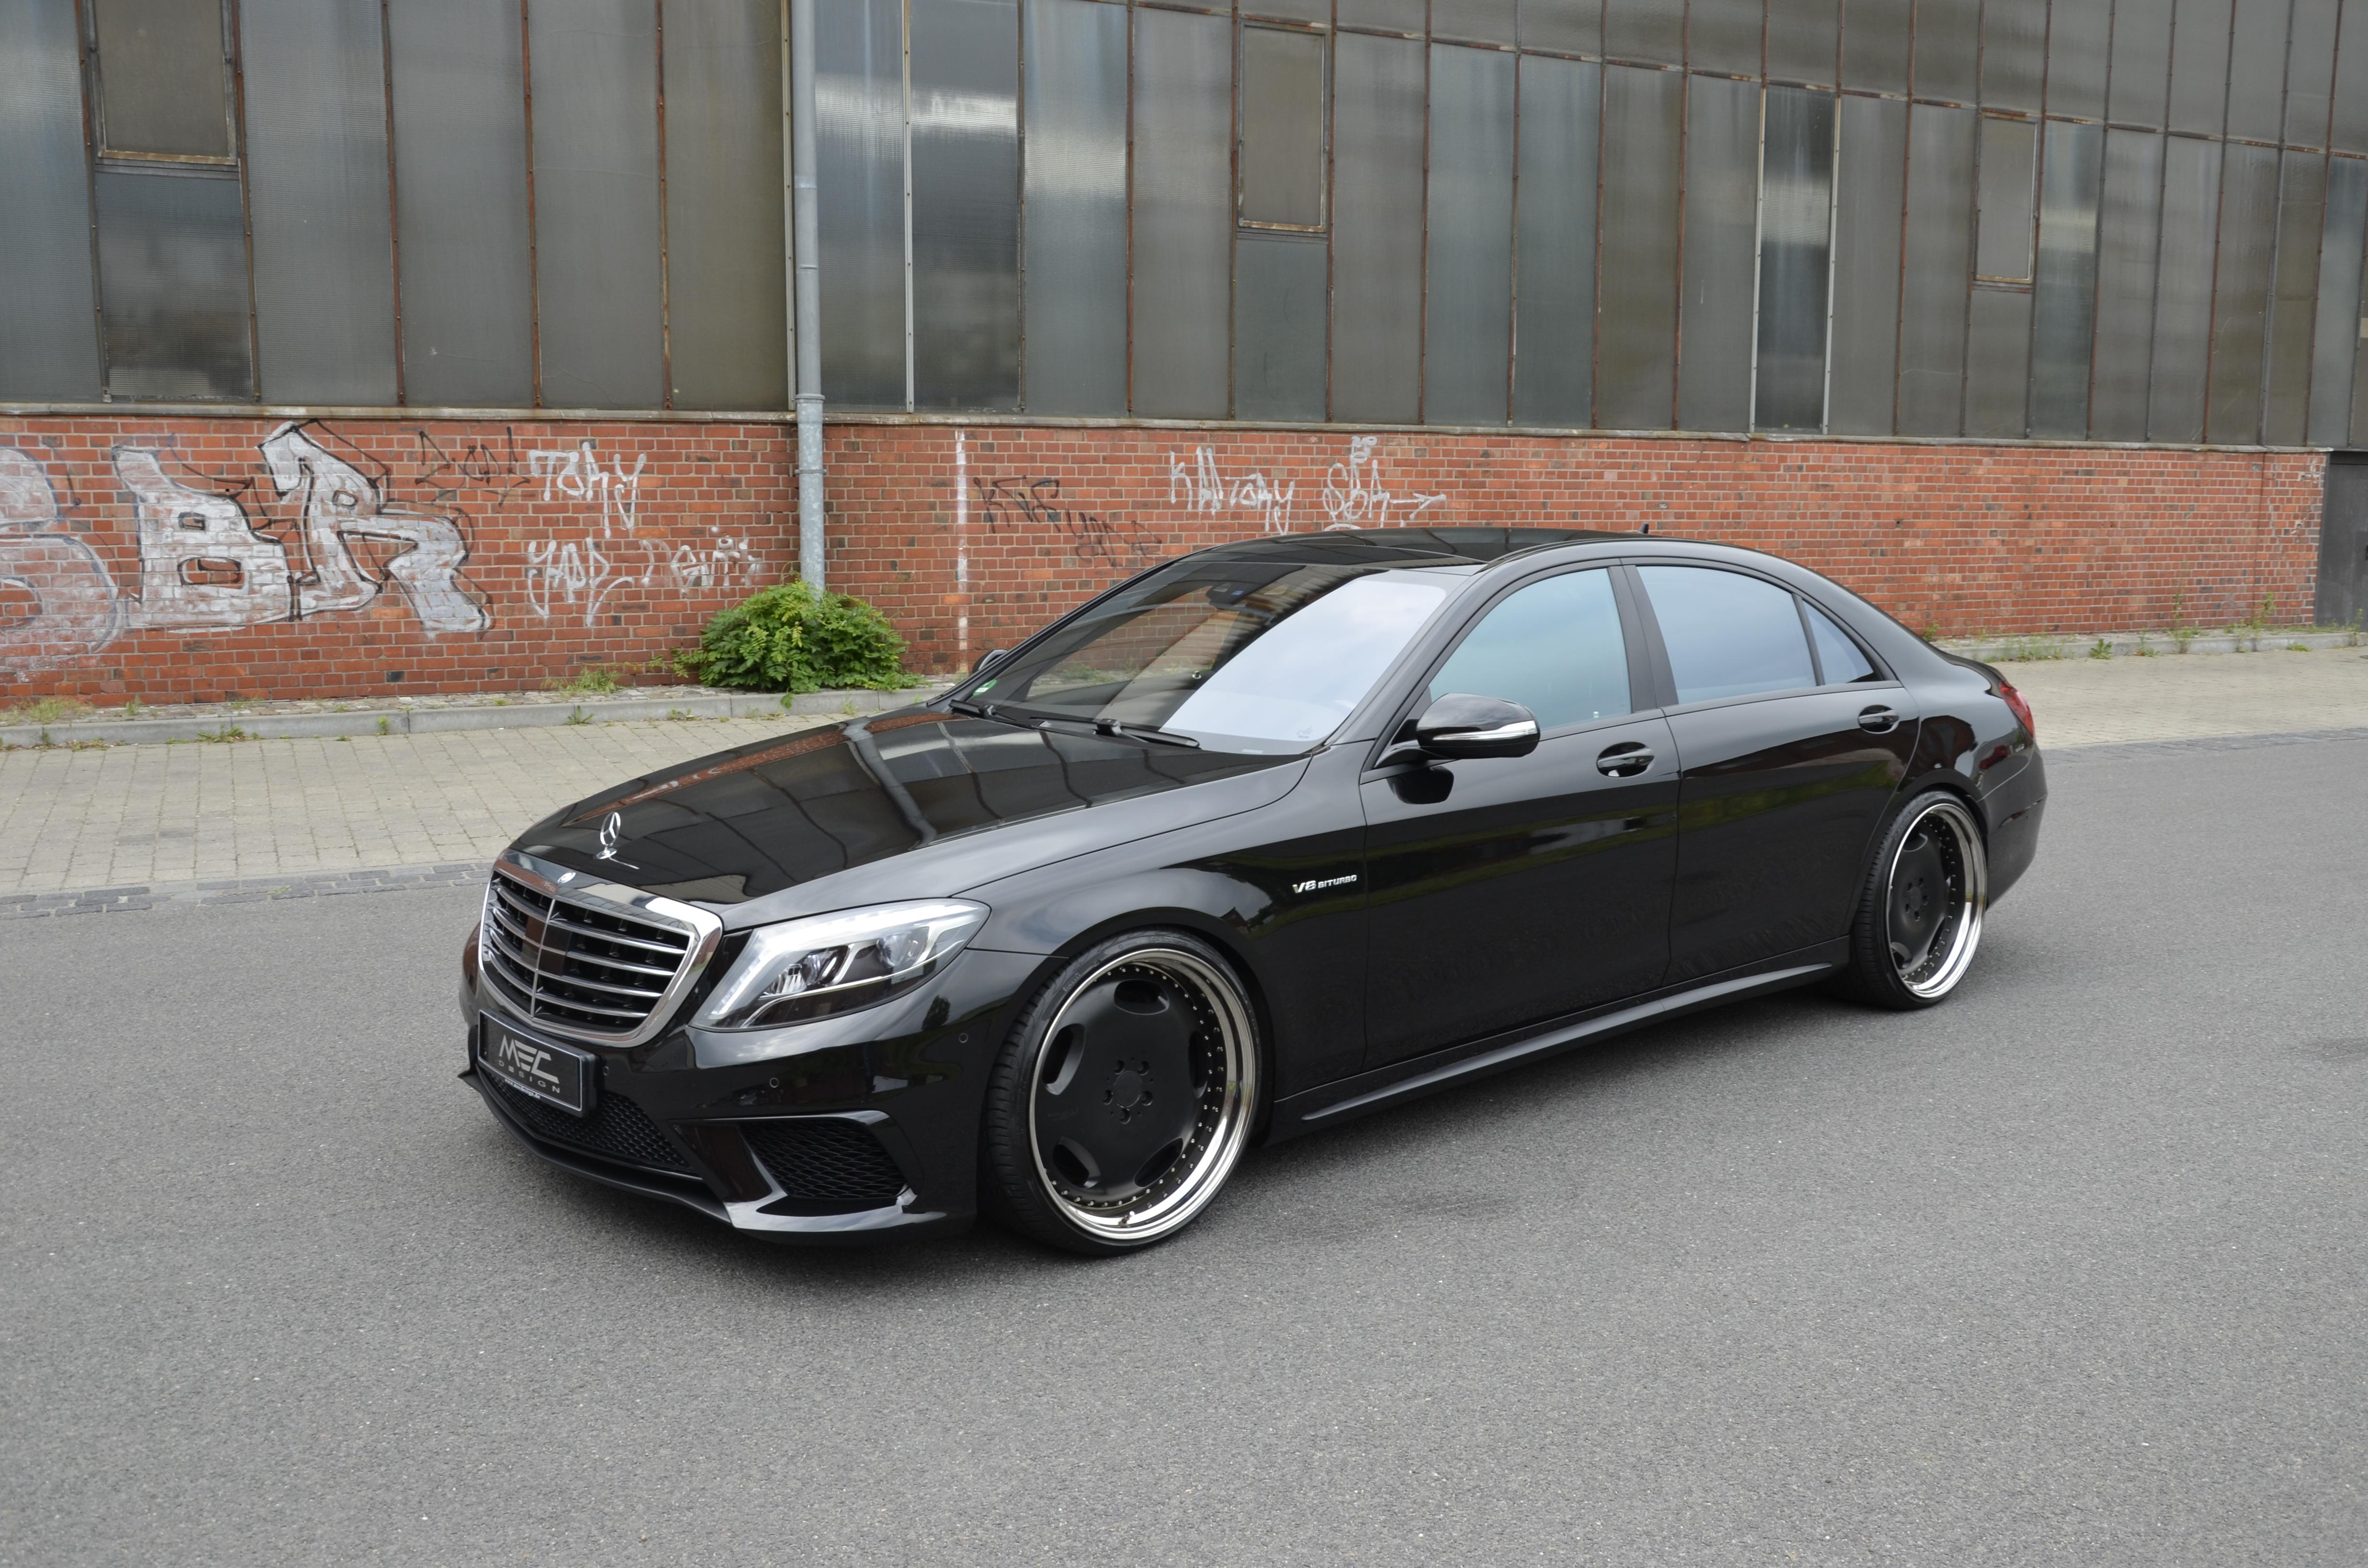 Mec Design Releases New Mods For The Mercedes S63 Amg Benzinsider